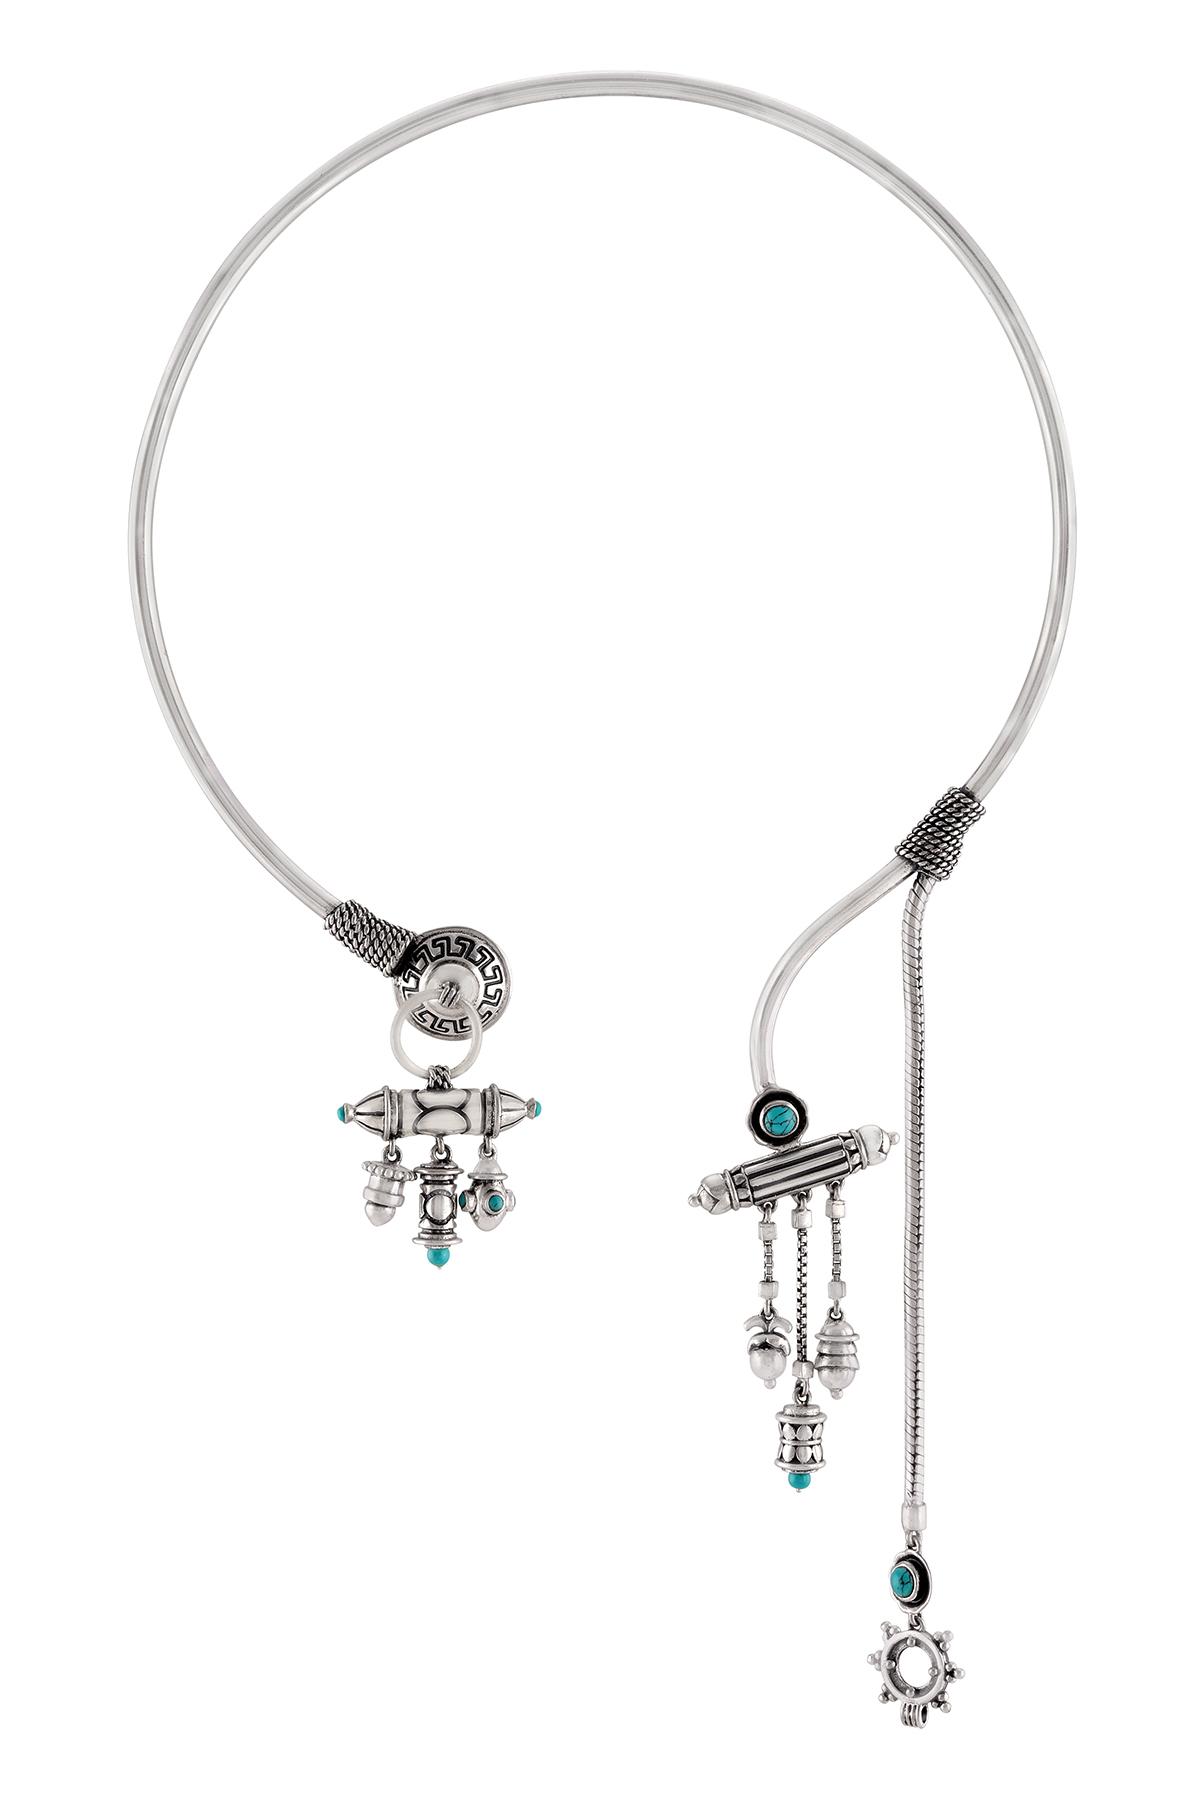 Silver Oxidised Tibetan Motif Turquoise Drop Choker